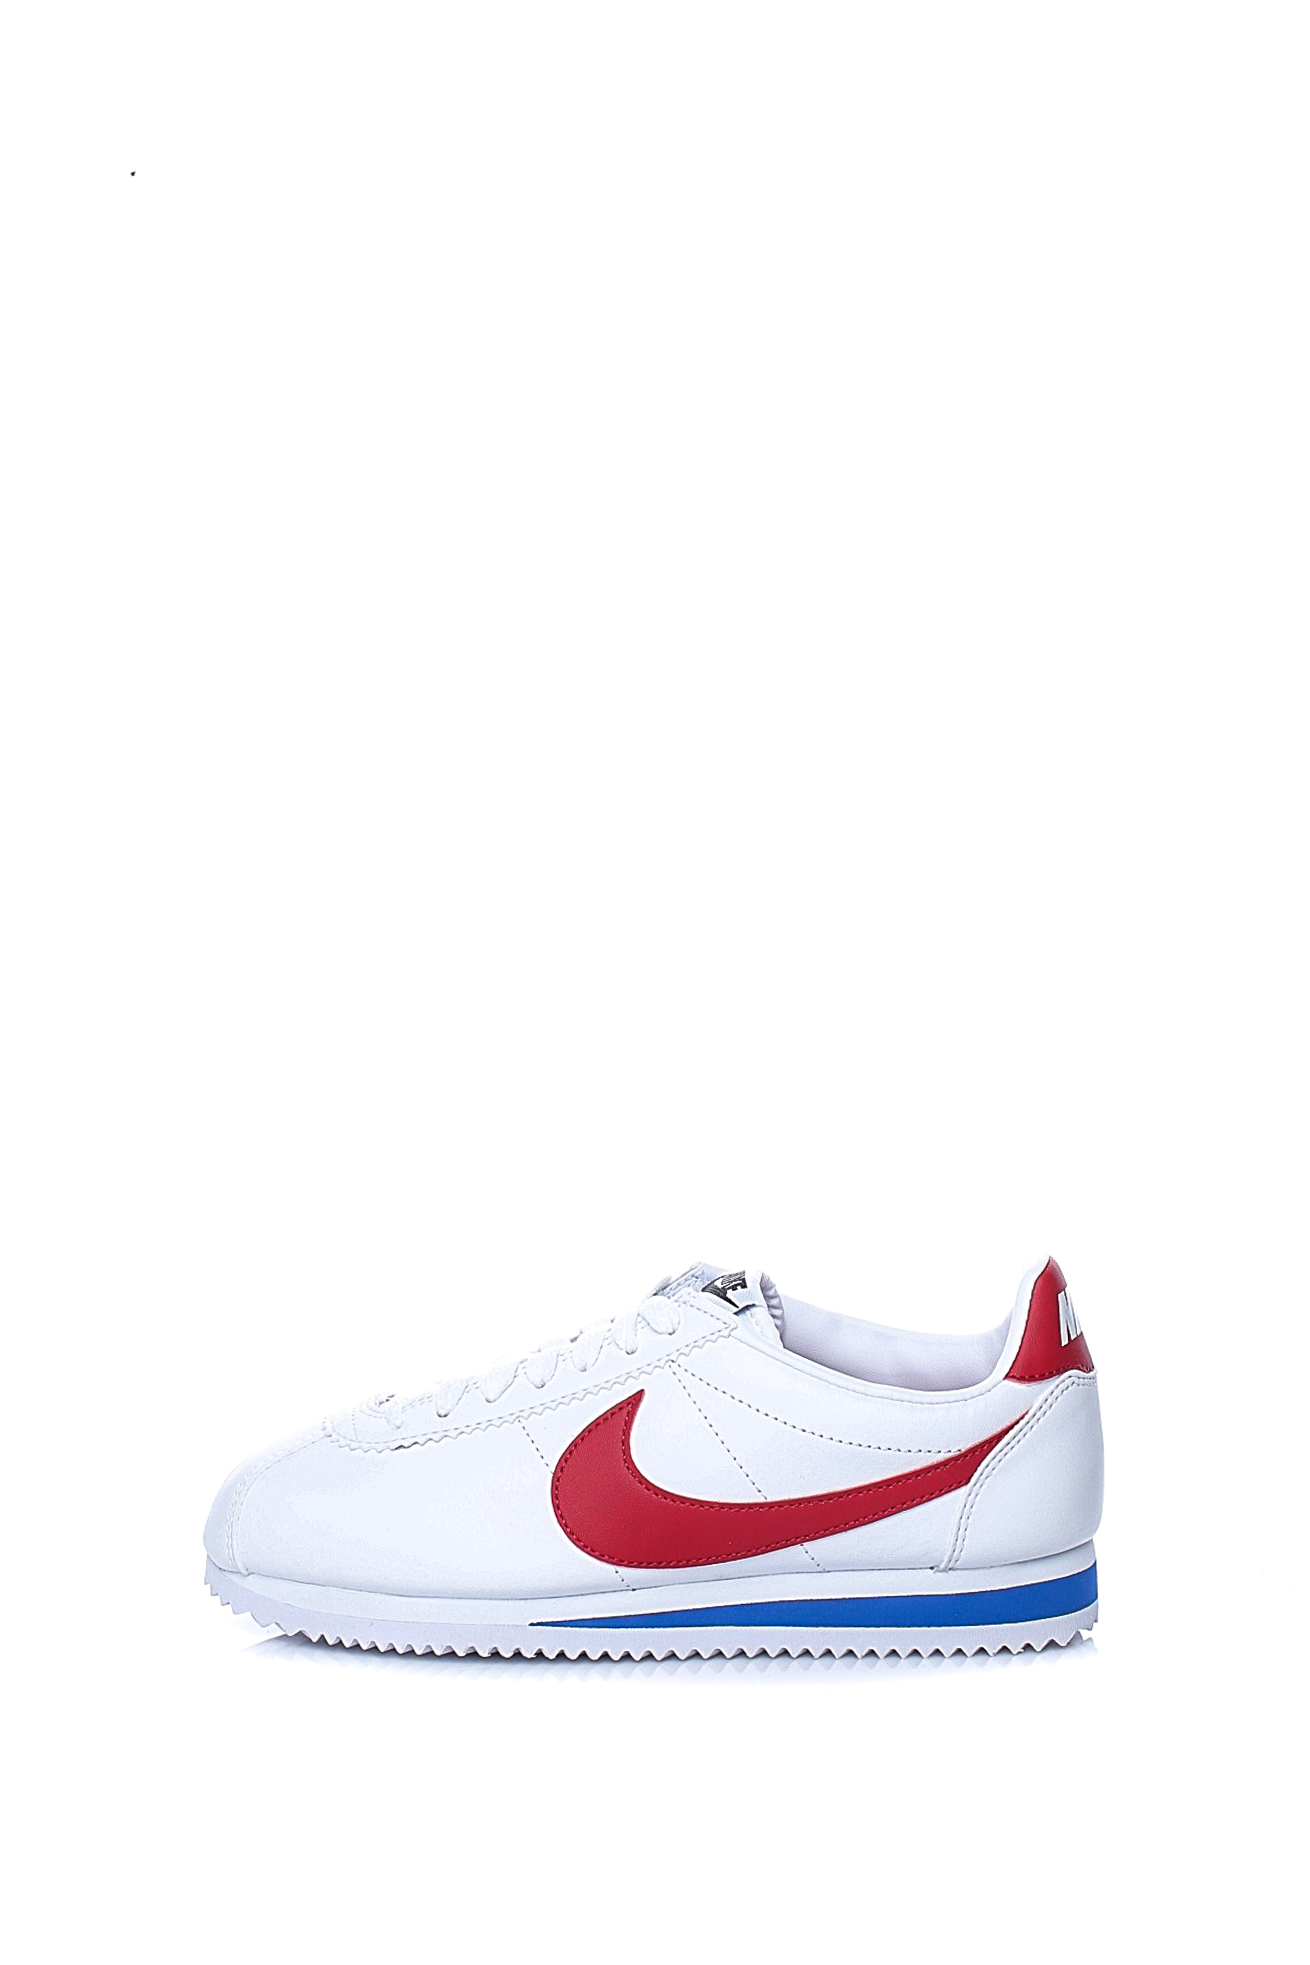 NIKE – Γυναικεία παπούτσια NIKE CLASSIC CORTEZ λευκά